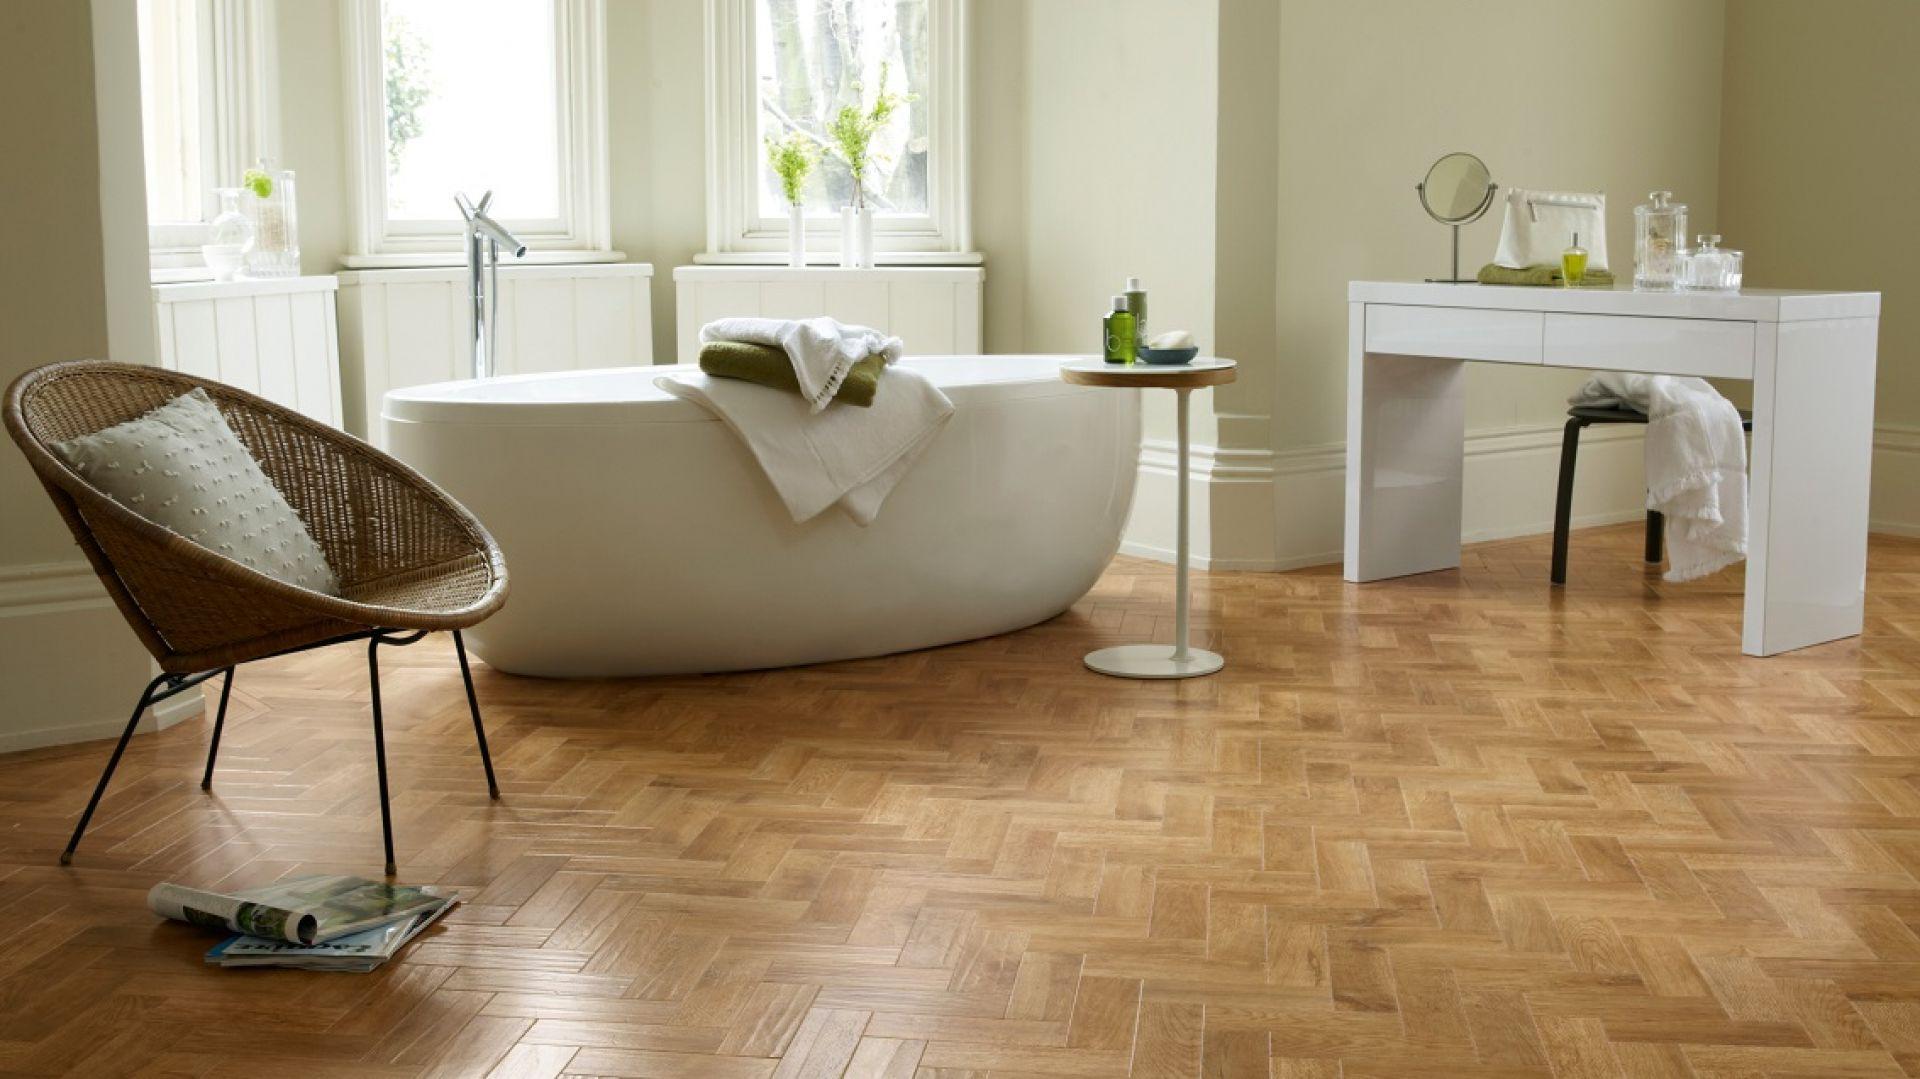 Podłoga w łazience: panele winylowe marki Designflooring. Fot. Dekorian Home